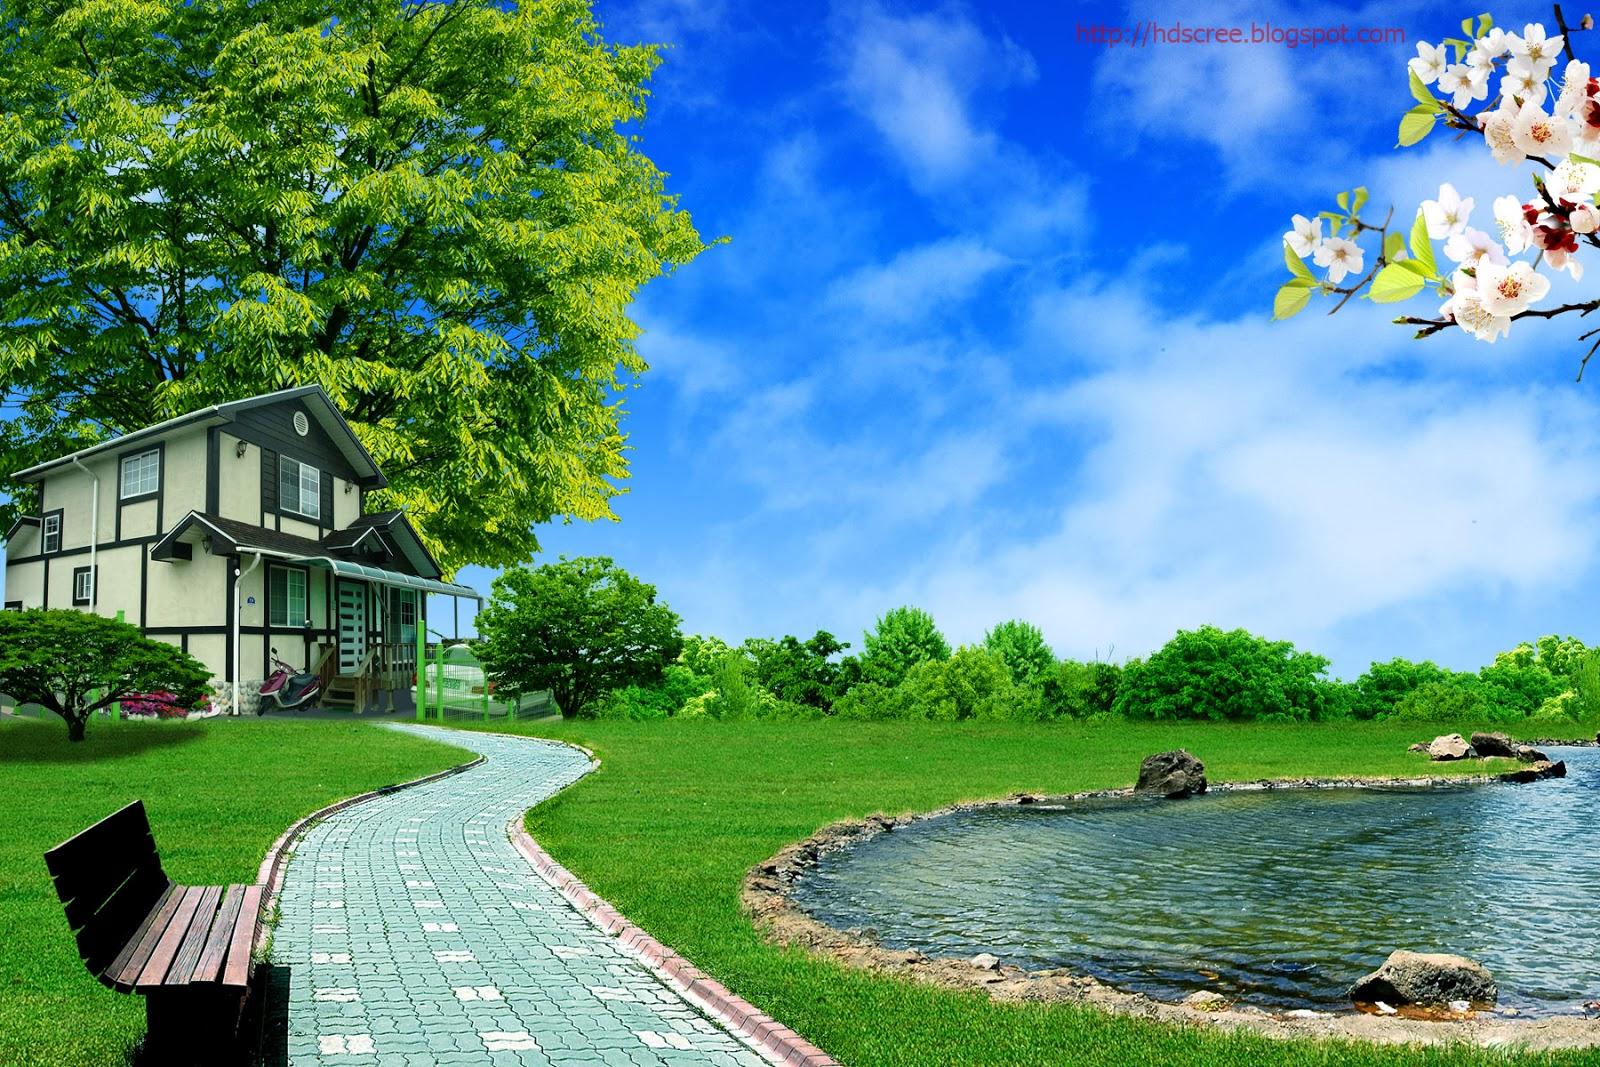 Beautiful Backgrounds Photo Download 1600x1067 Download Hd Wallpaper Wallpapertip